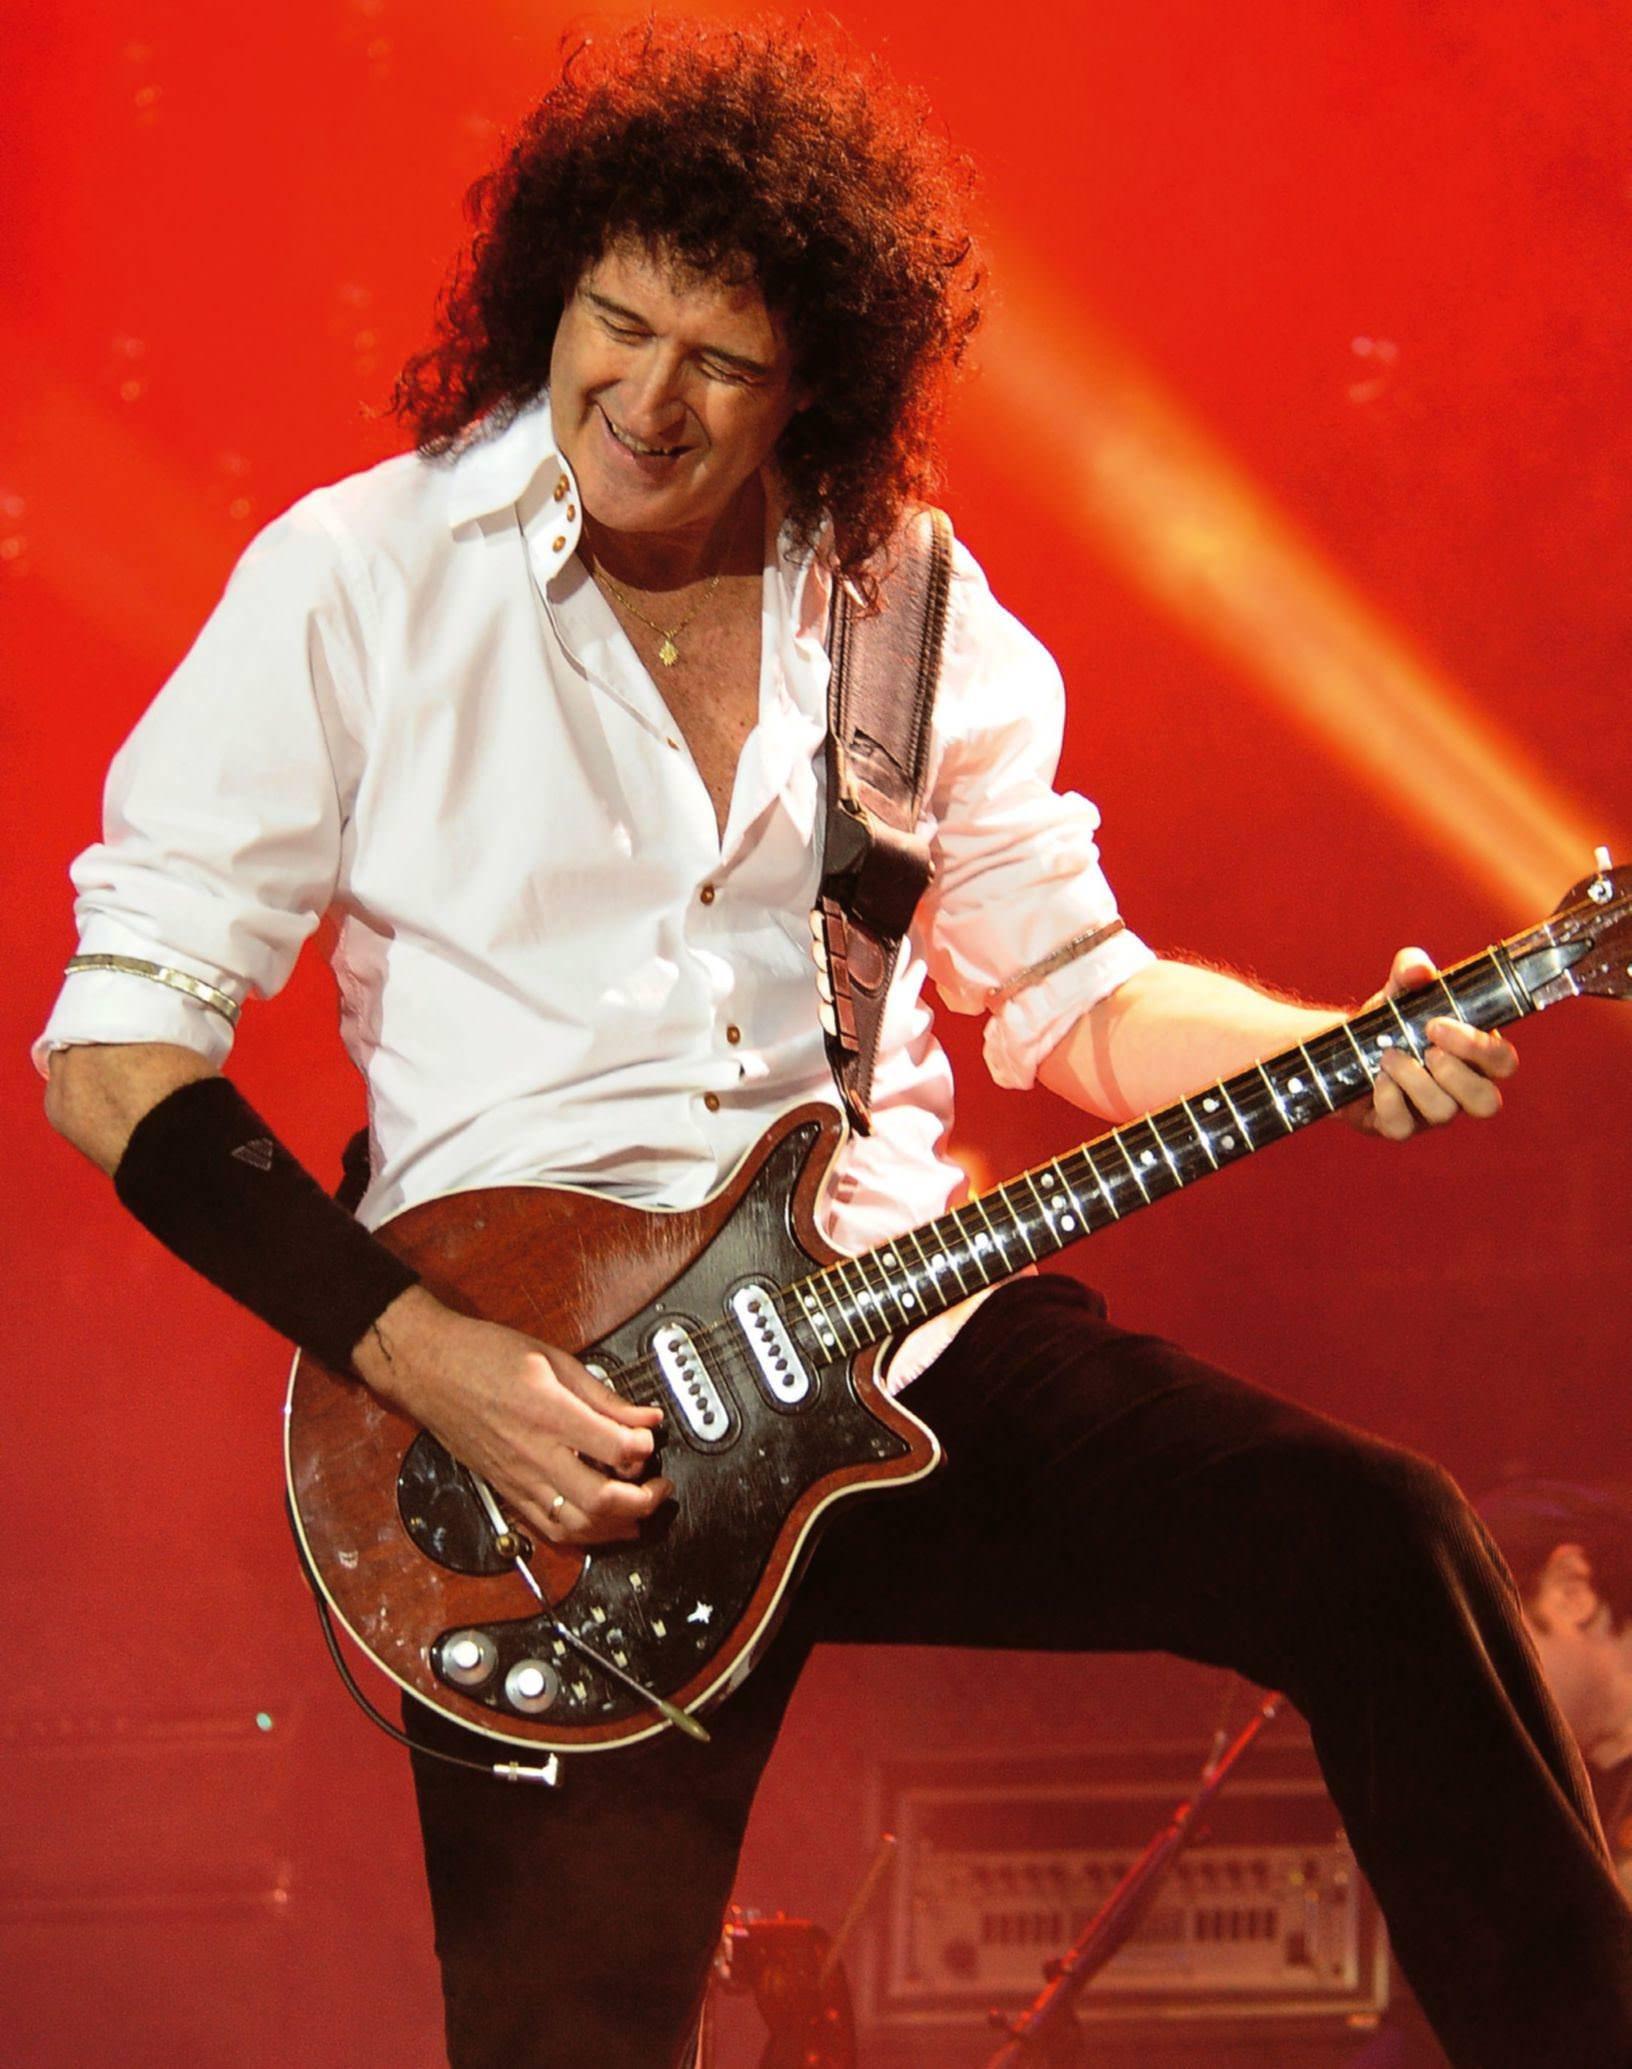 The Genius Of... Brian May